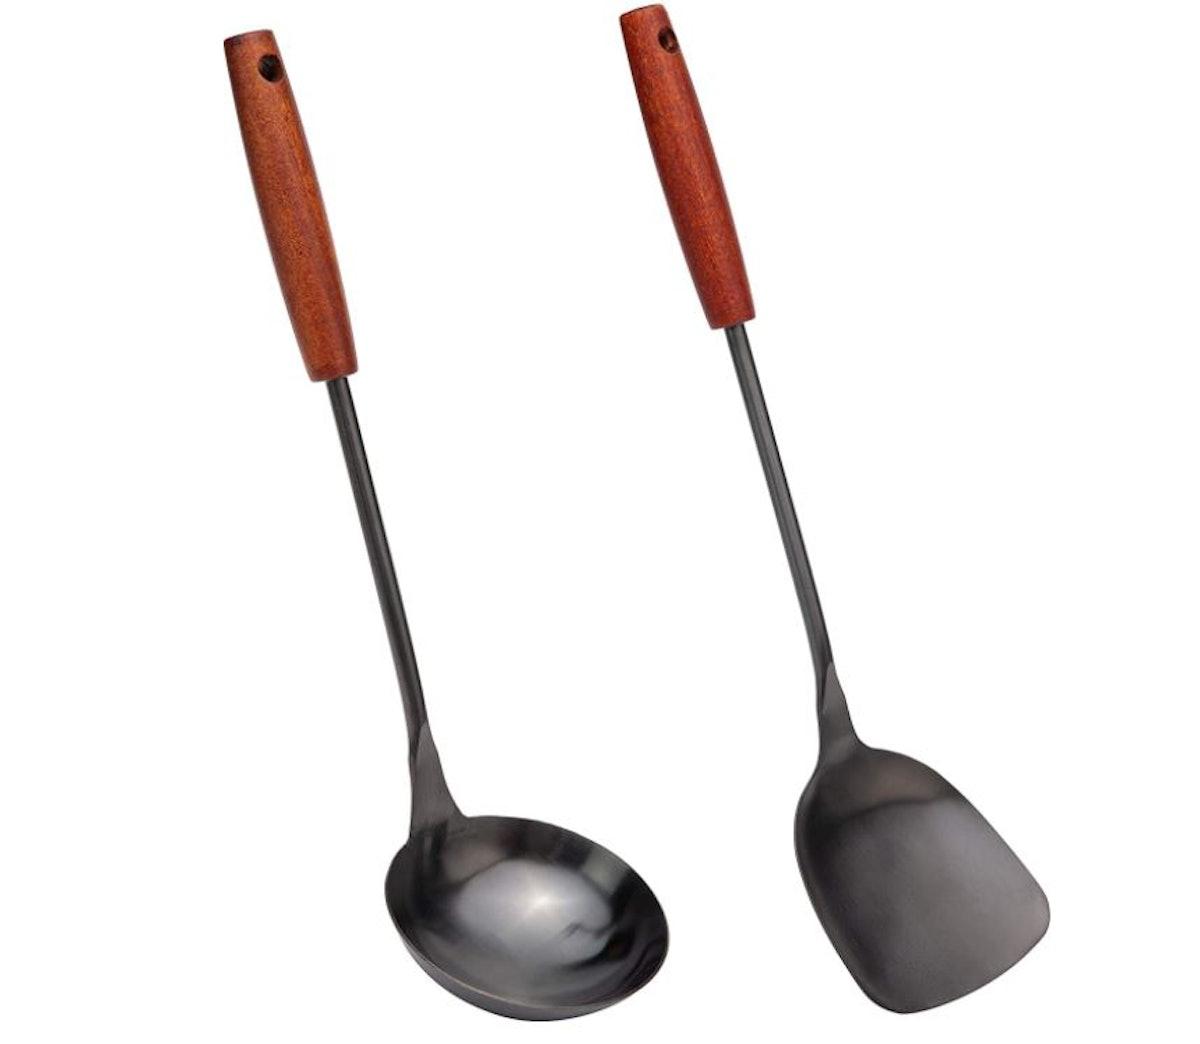 Fjnatinh Spatula & Ladle Wok Tool Set (15 Inches and 14.2 Inches)